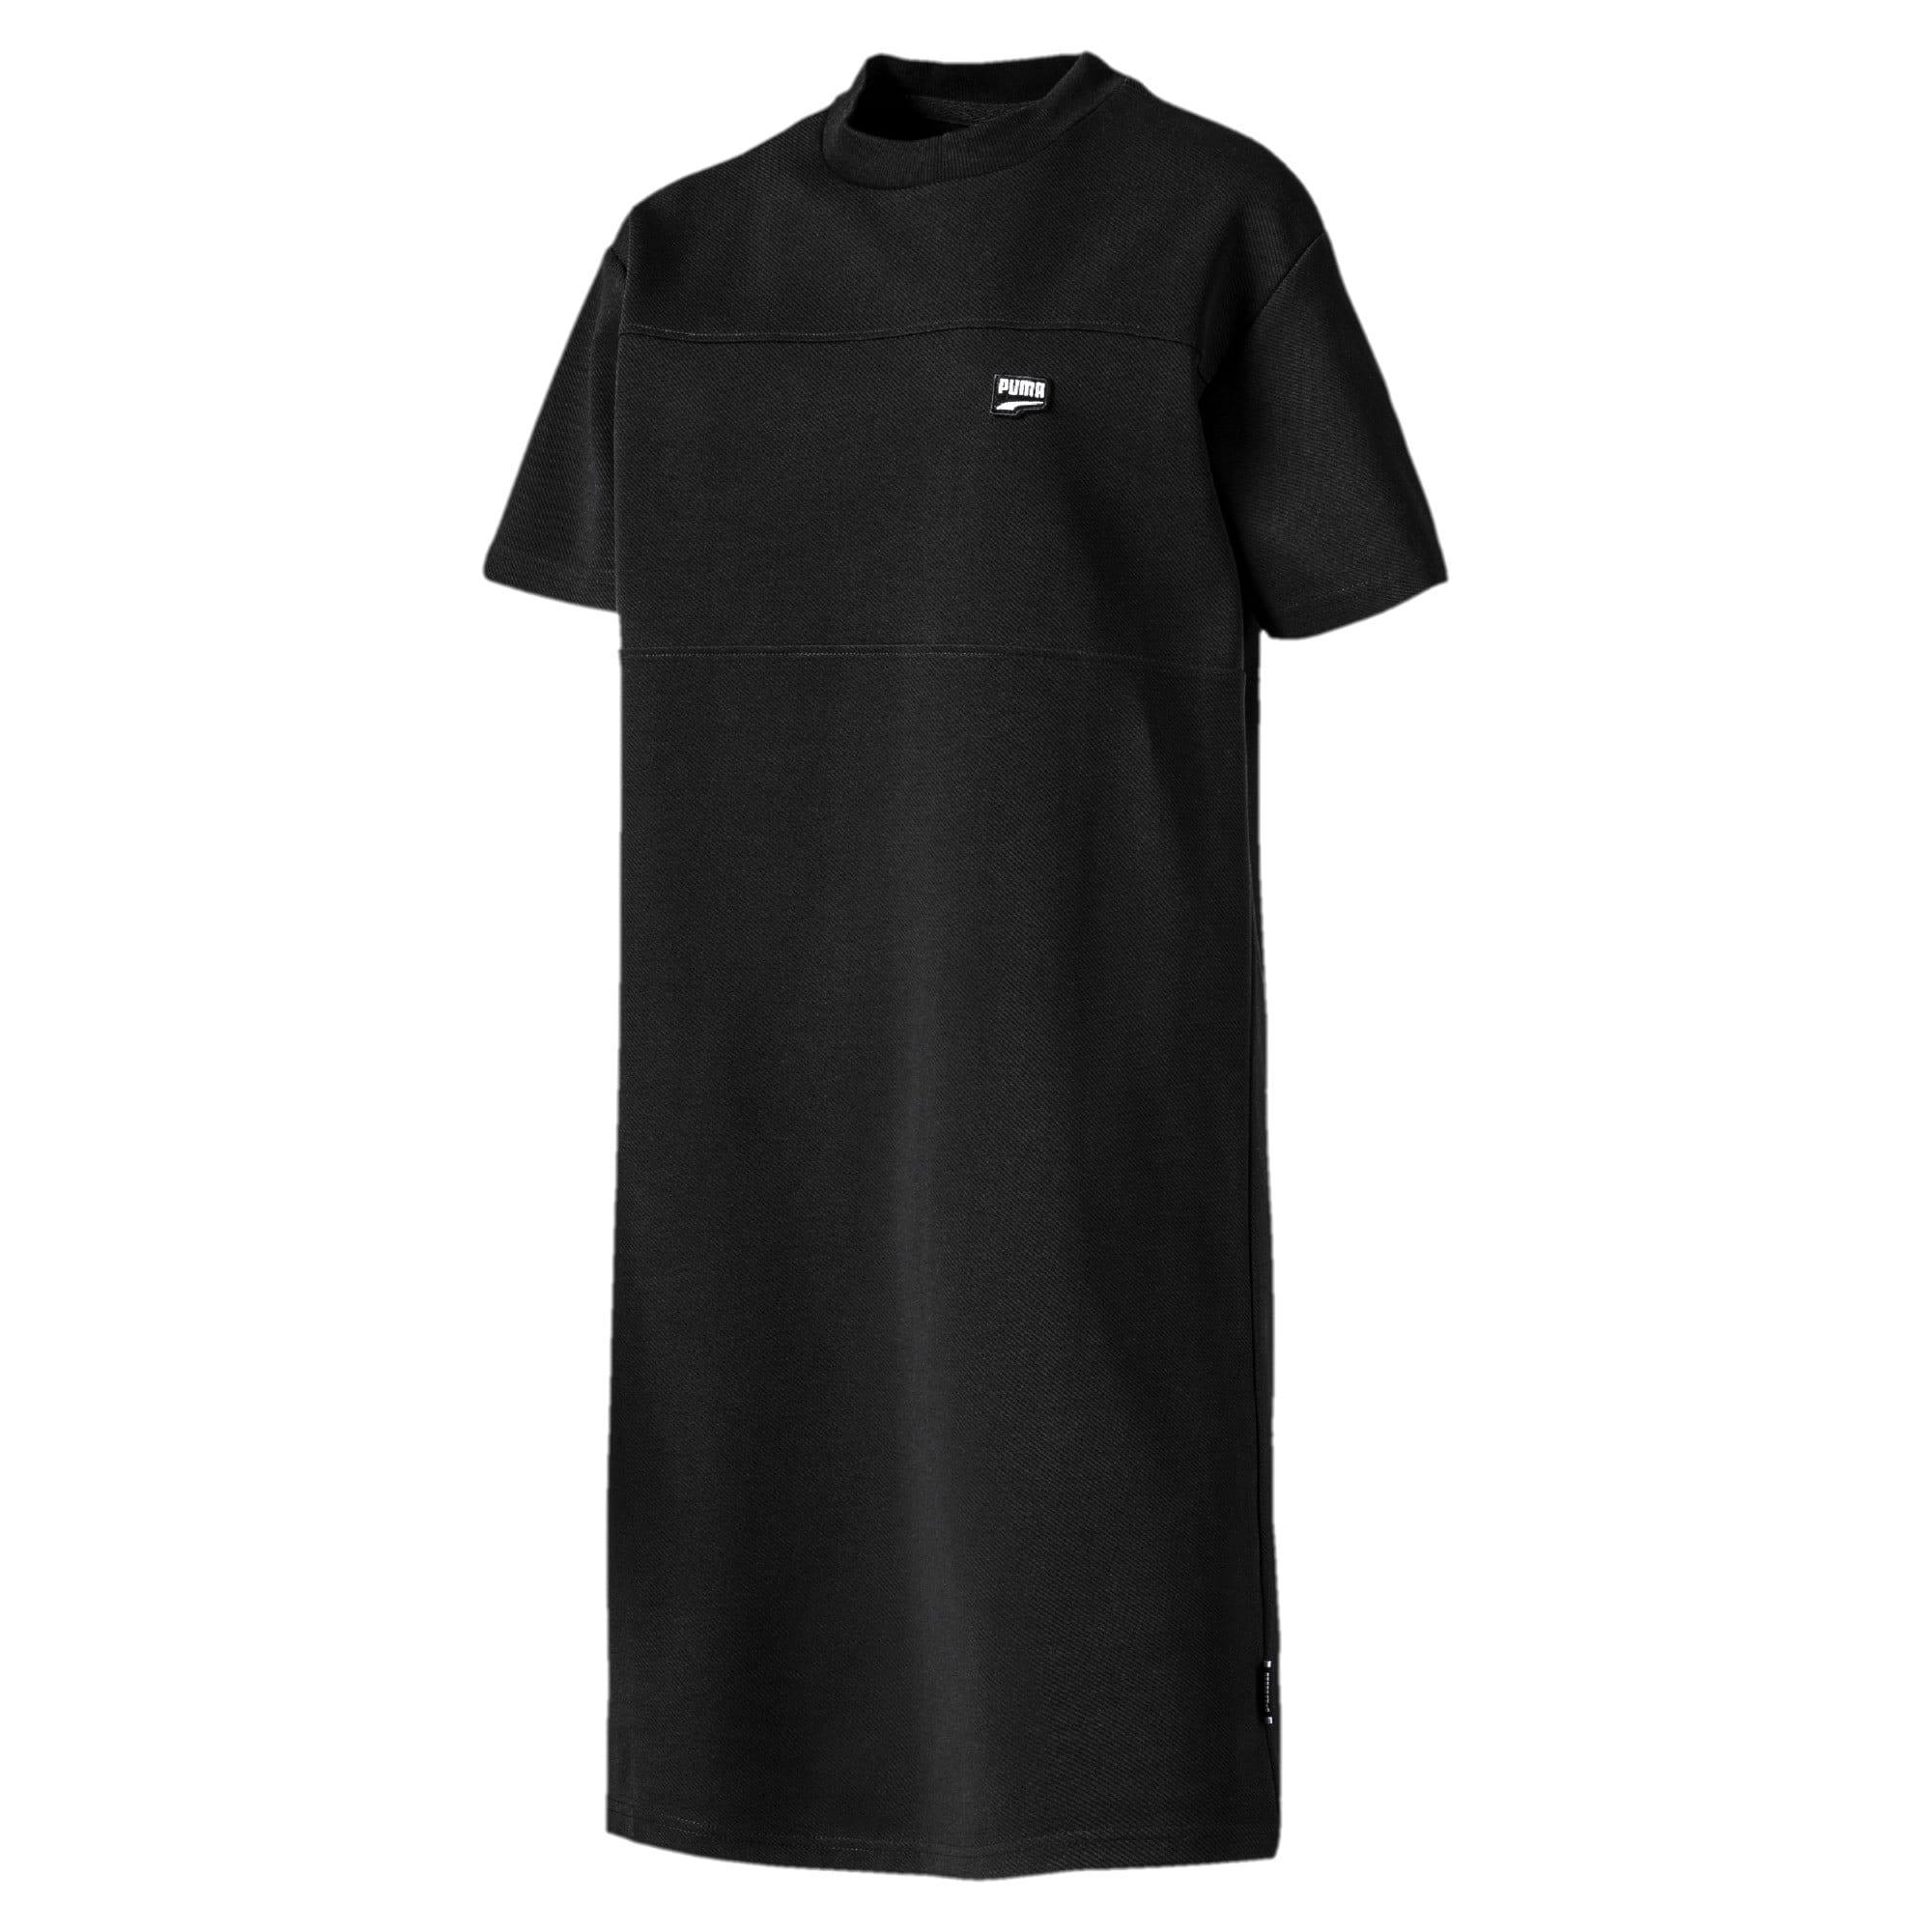 Anteprima 4 di Downtown Women's Dress, Puma Black, medio